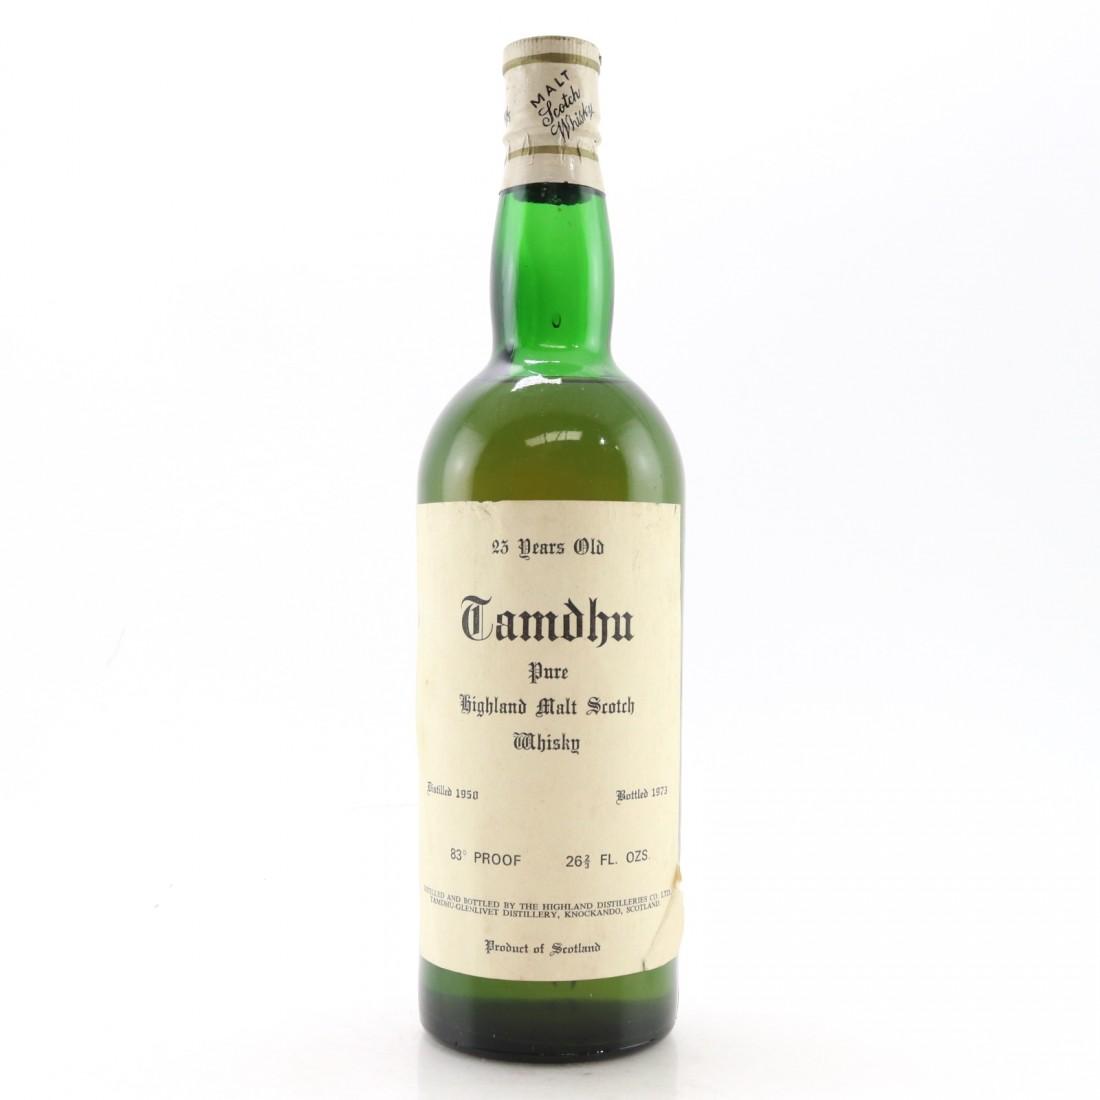 Tamdhu 1950 23 Year Old